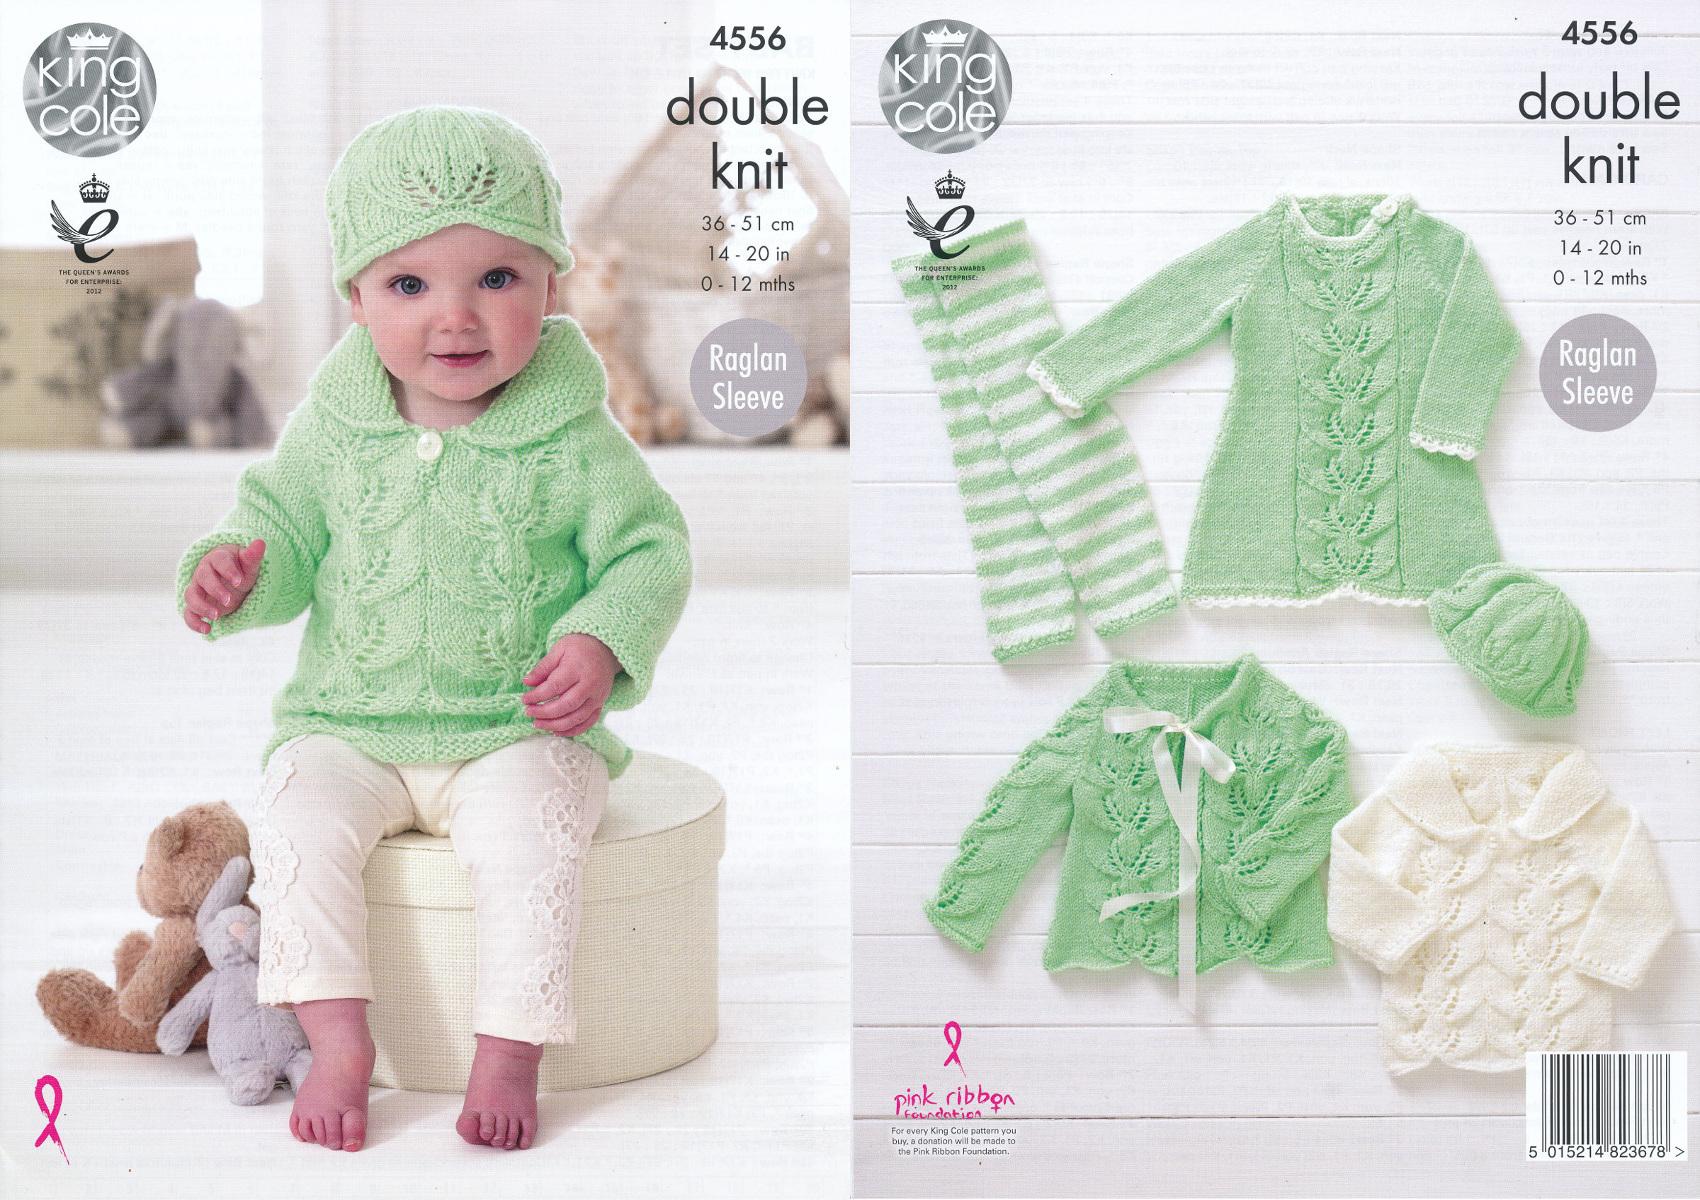 Knitting Pattern King Cole Baby DK Dress Cardigan Jumper Leggings ...